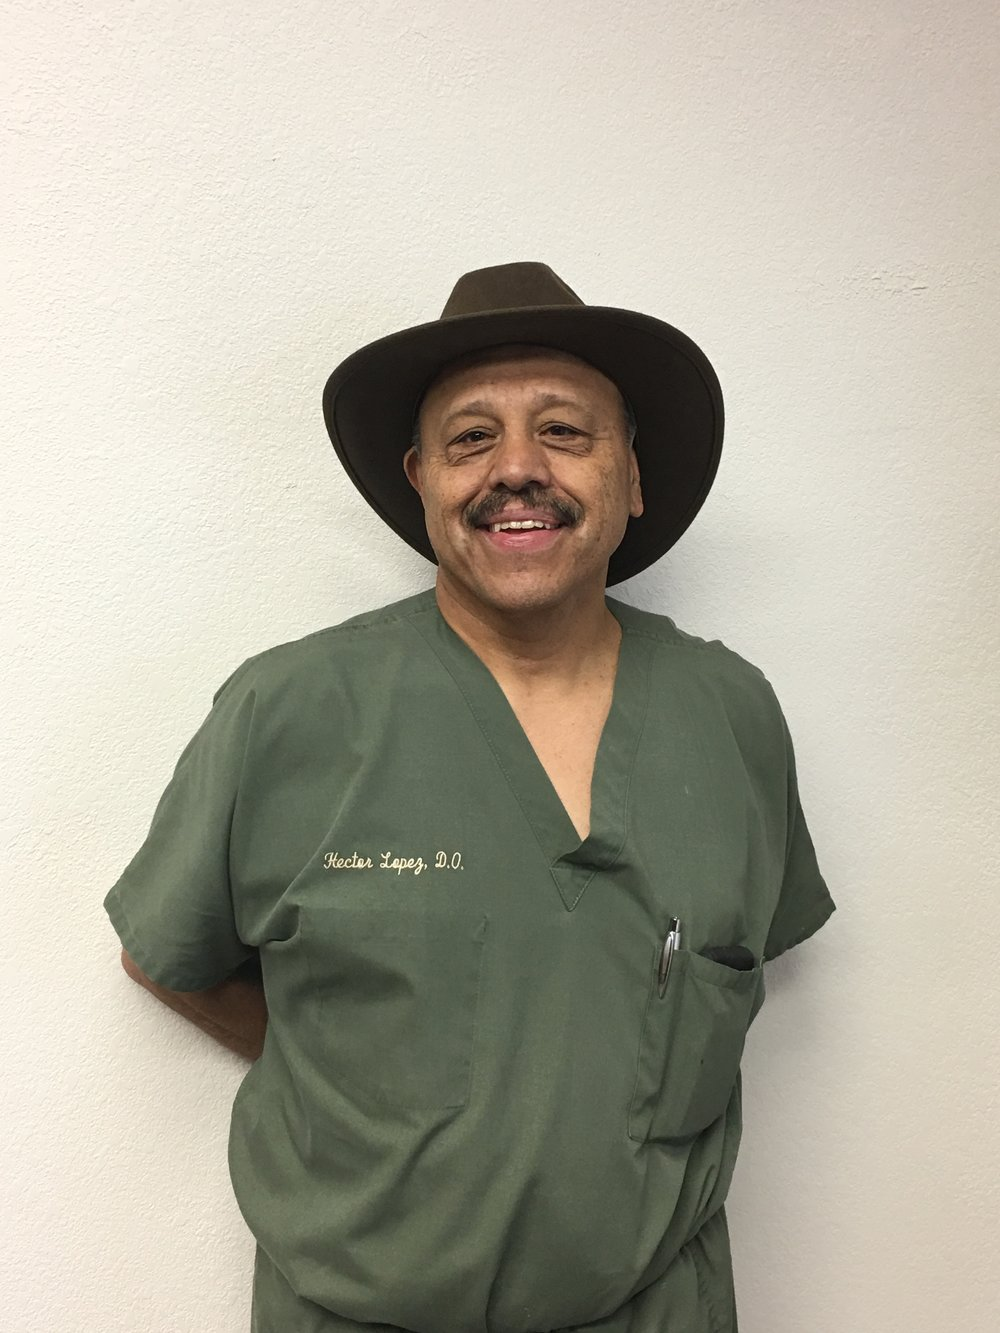 doctor lopez.JPG